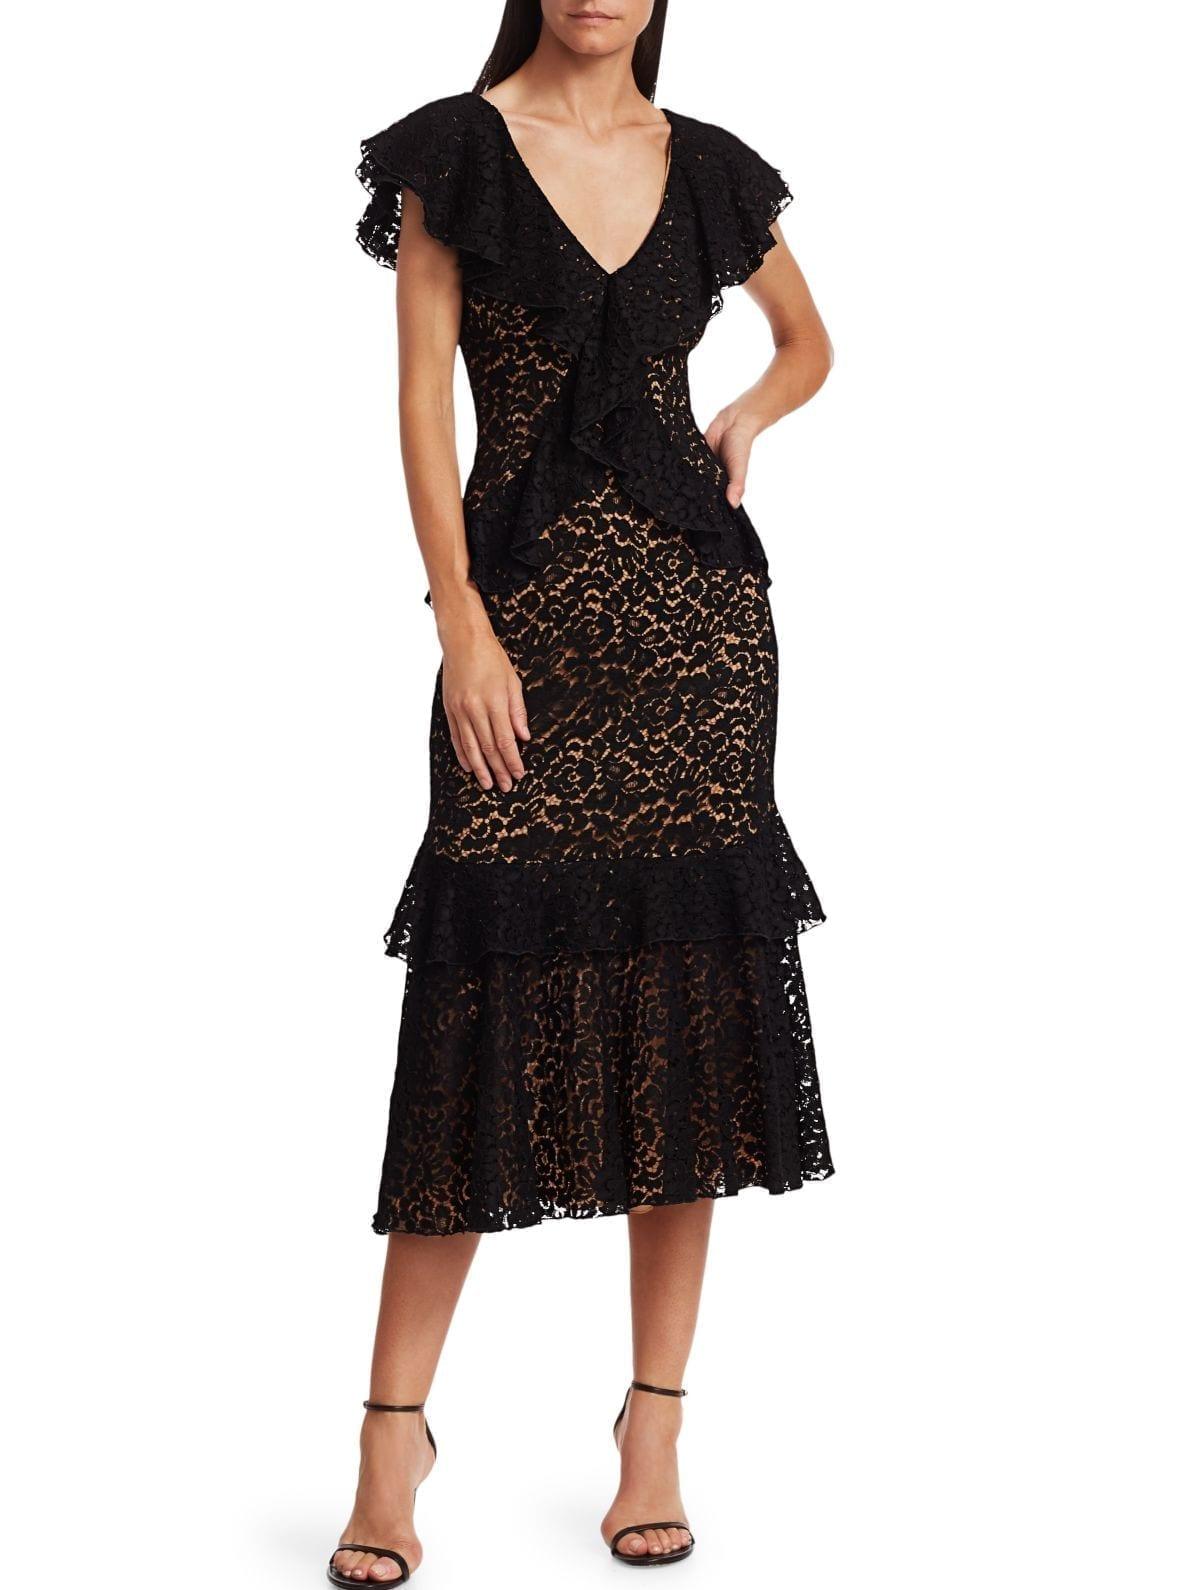 MICHAEL KORS COLLECTION Lace V-Neck Ruffle Midi Dress